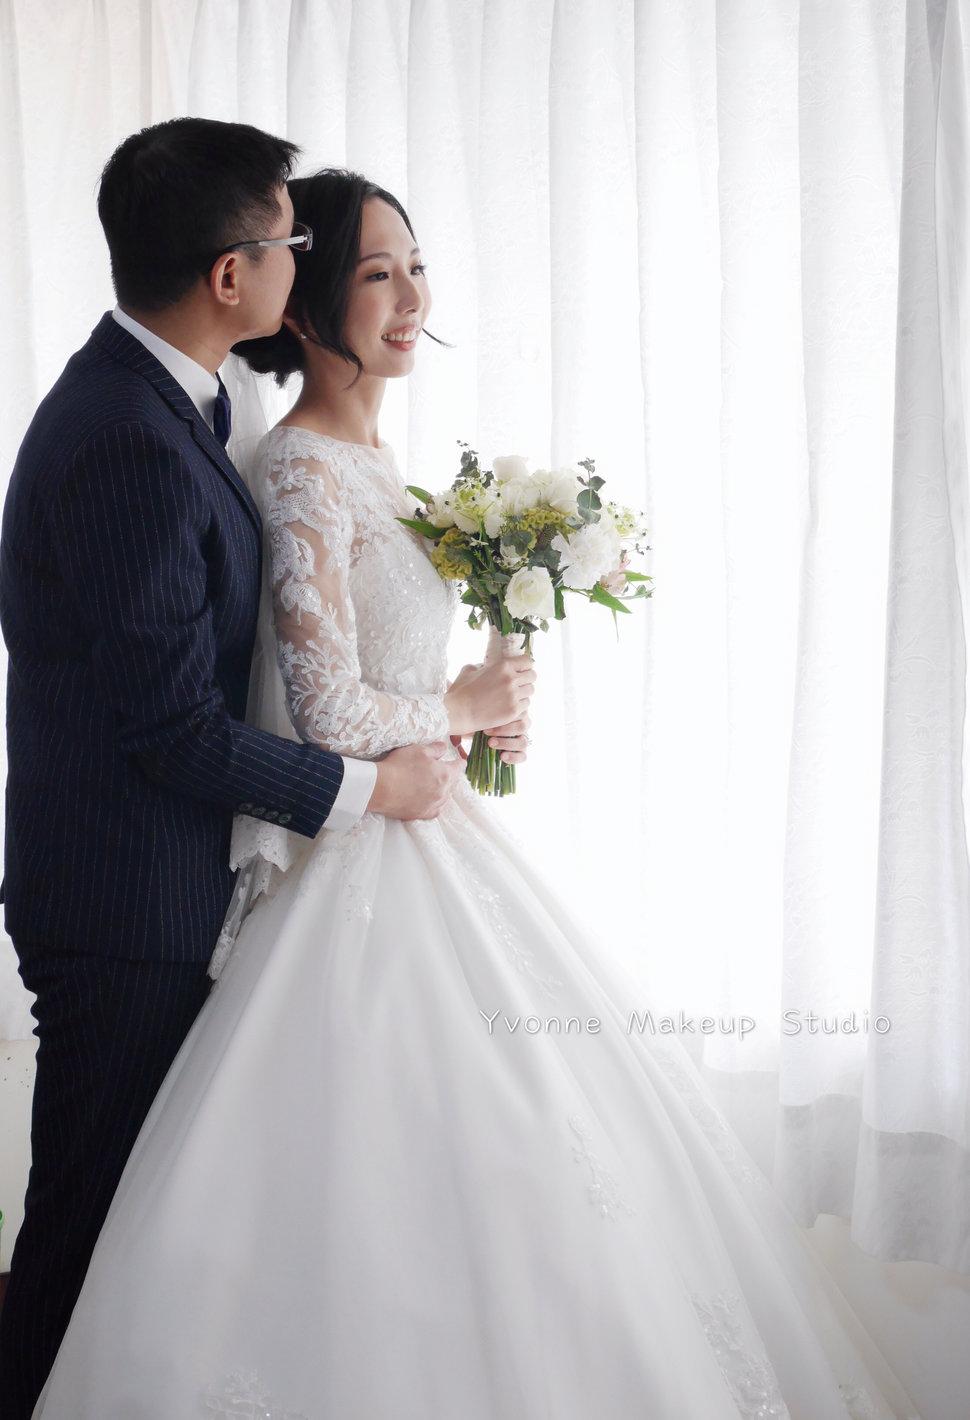 IMG_8604 - 做懂妳的新秘 Yvonne 嘉云《結婚吧》